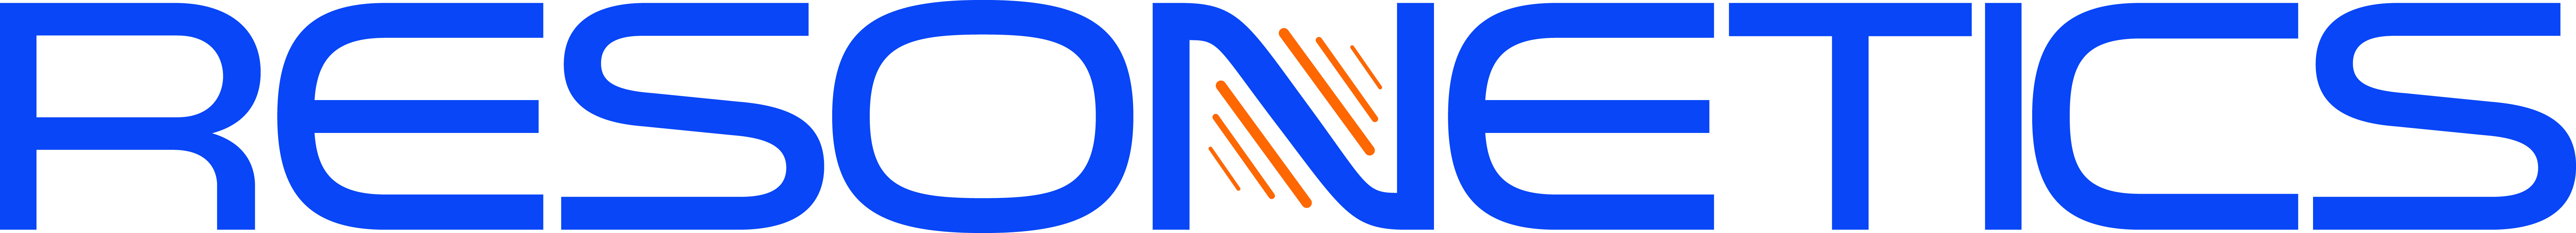 Resonetics logo